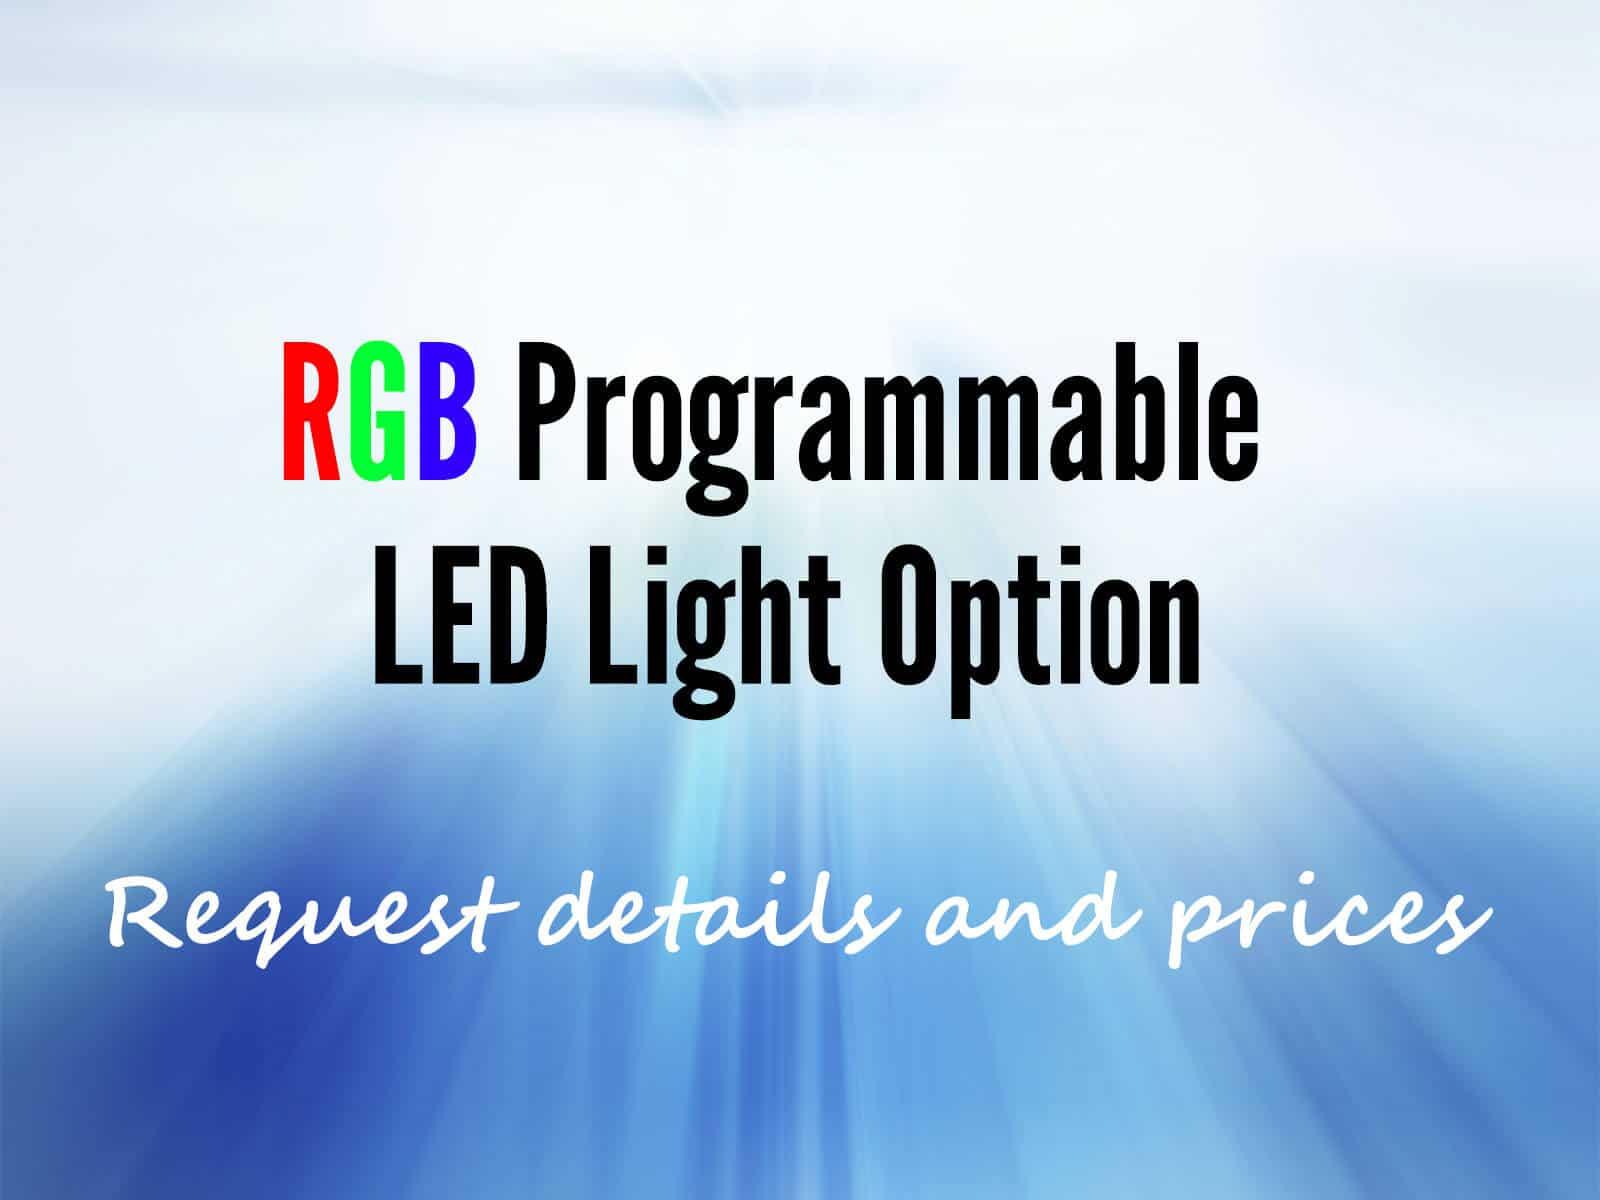 RGB Programmable LED Light Option - Request Details